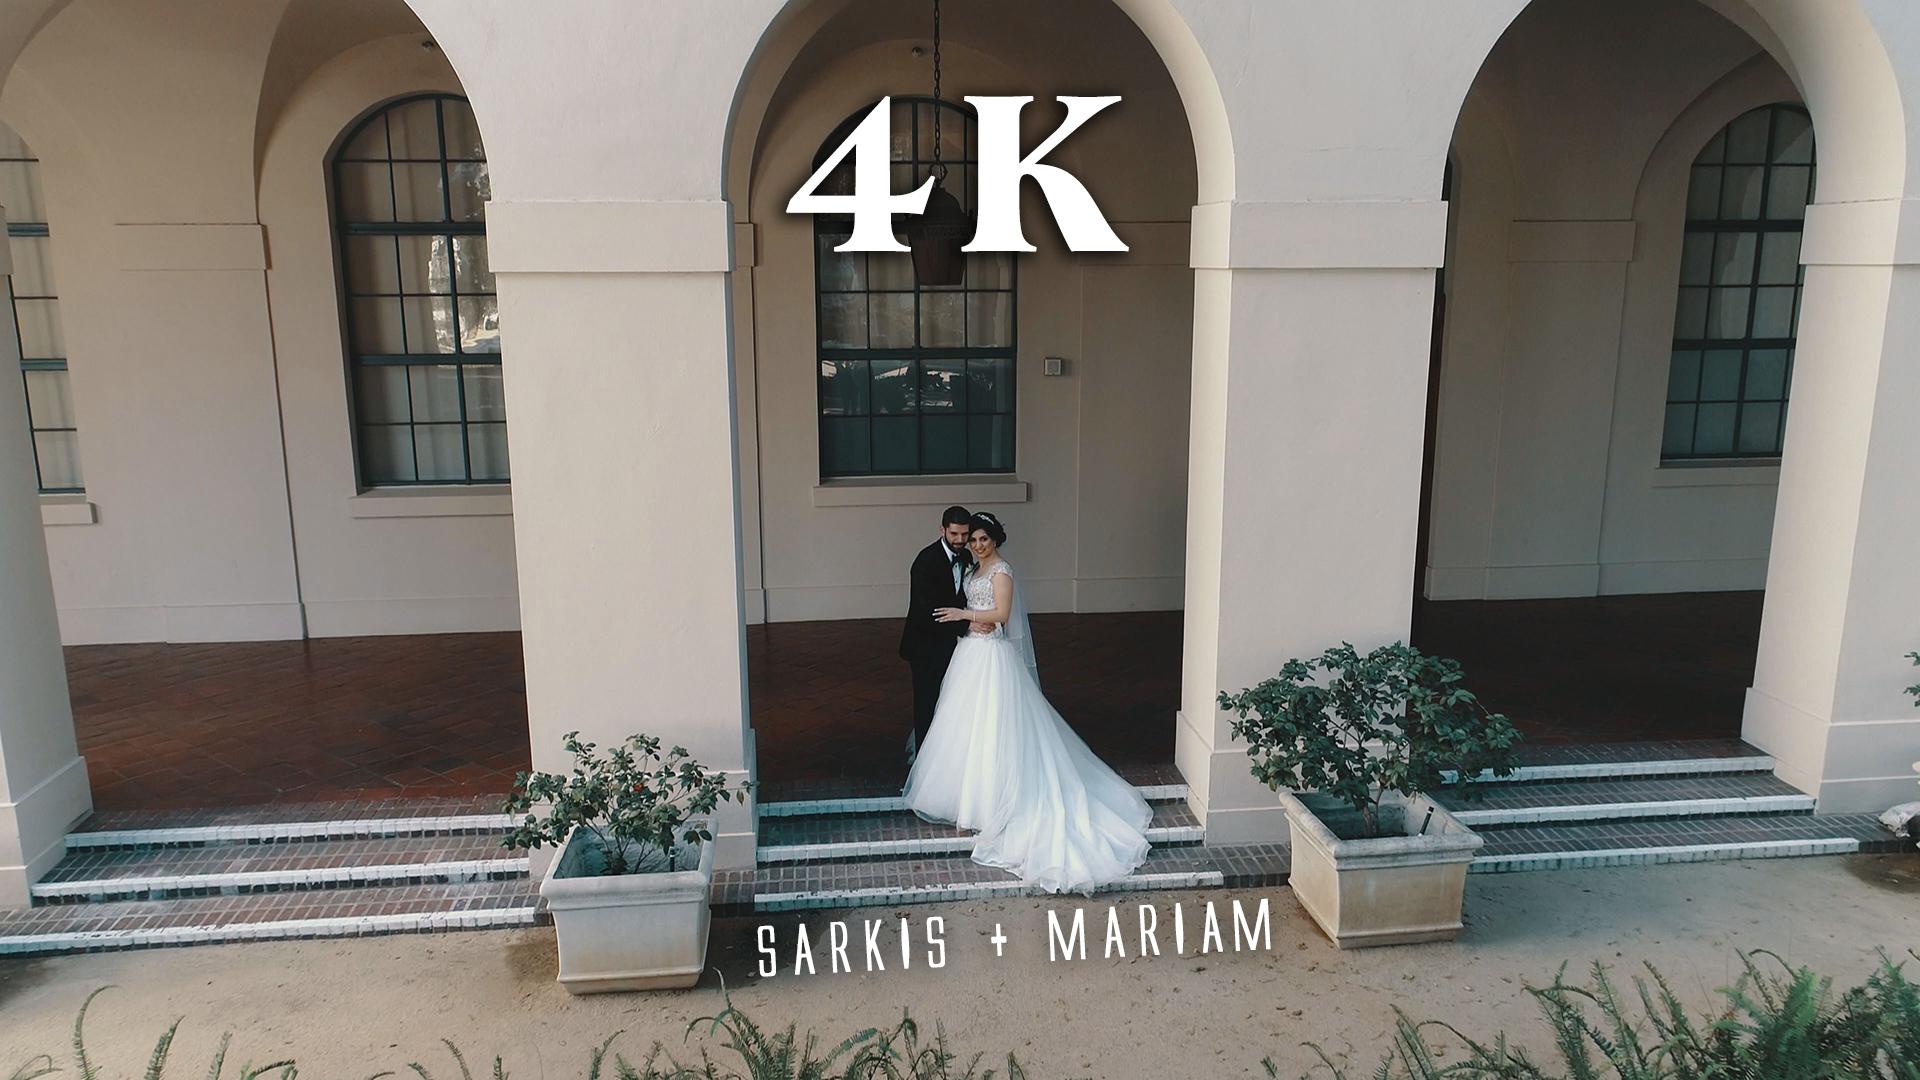 Sarkis + Mariam | Glendale, California | Metropol venue